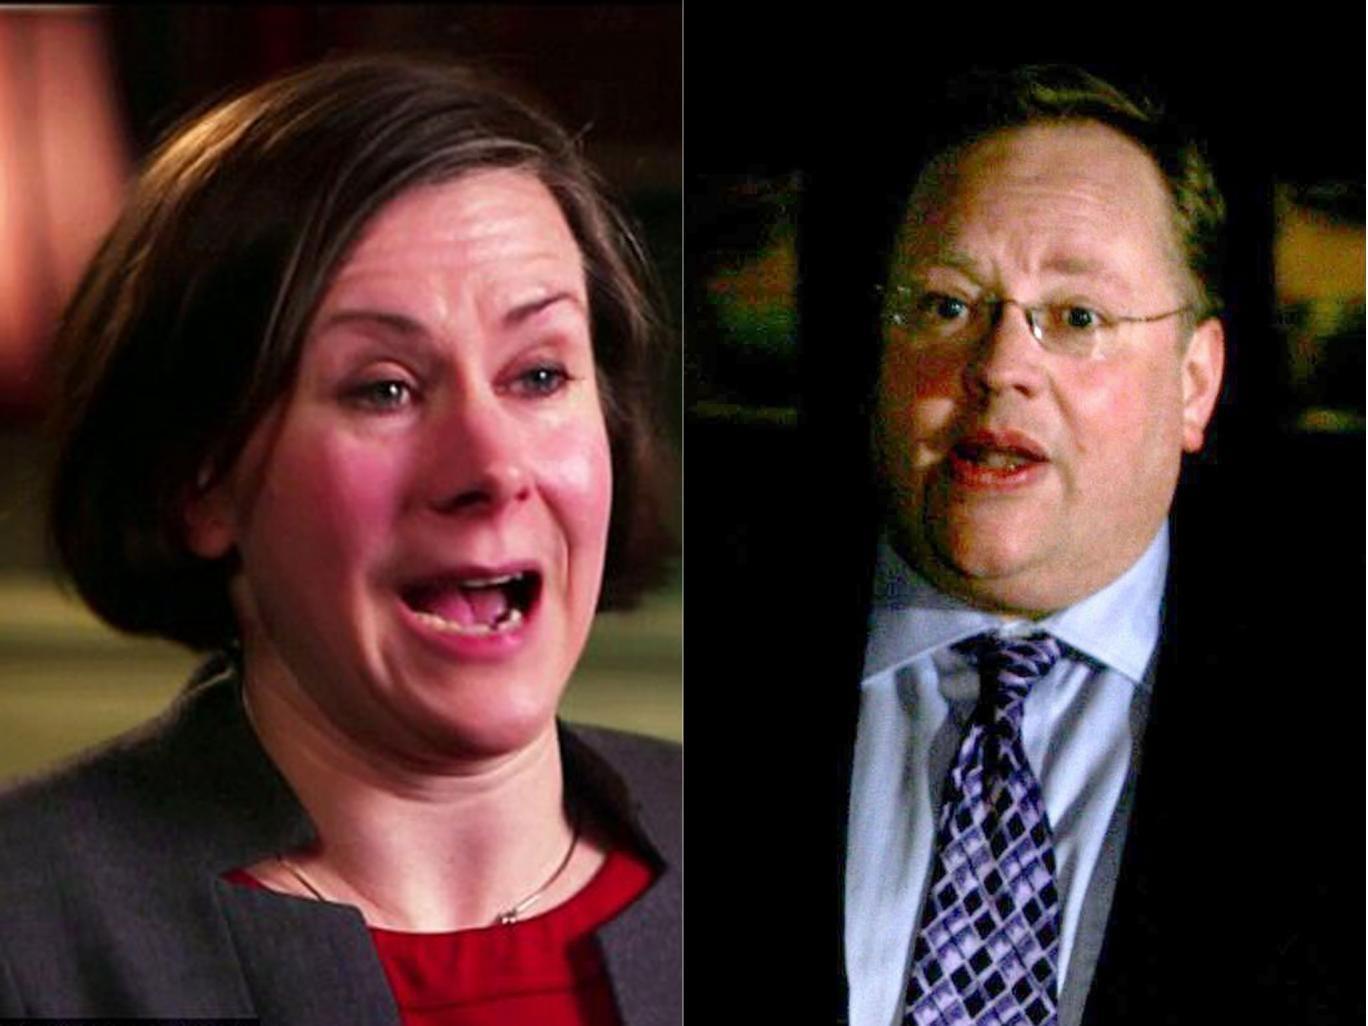 Bridget Harris, left, a former Clegg aide, has quit over the Lord Rennard affair